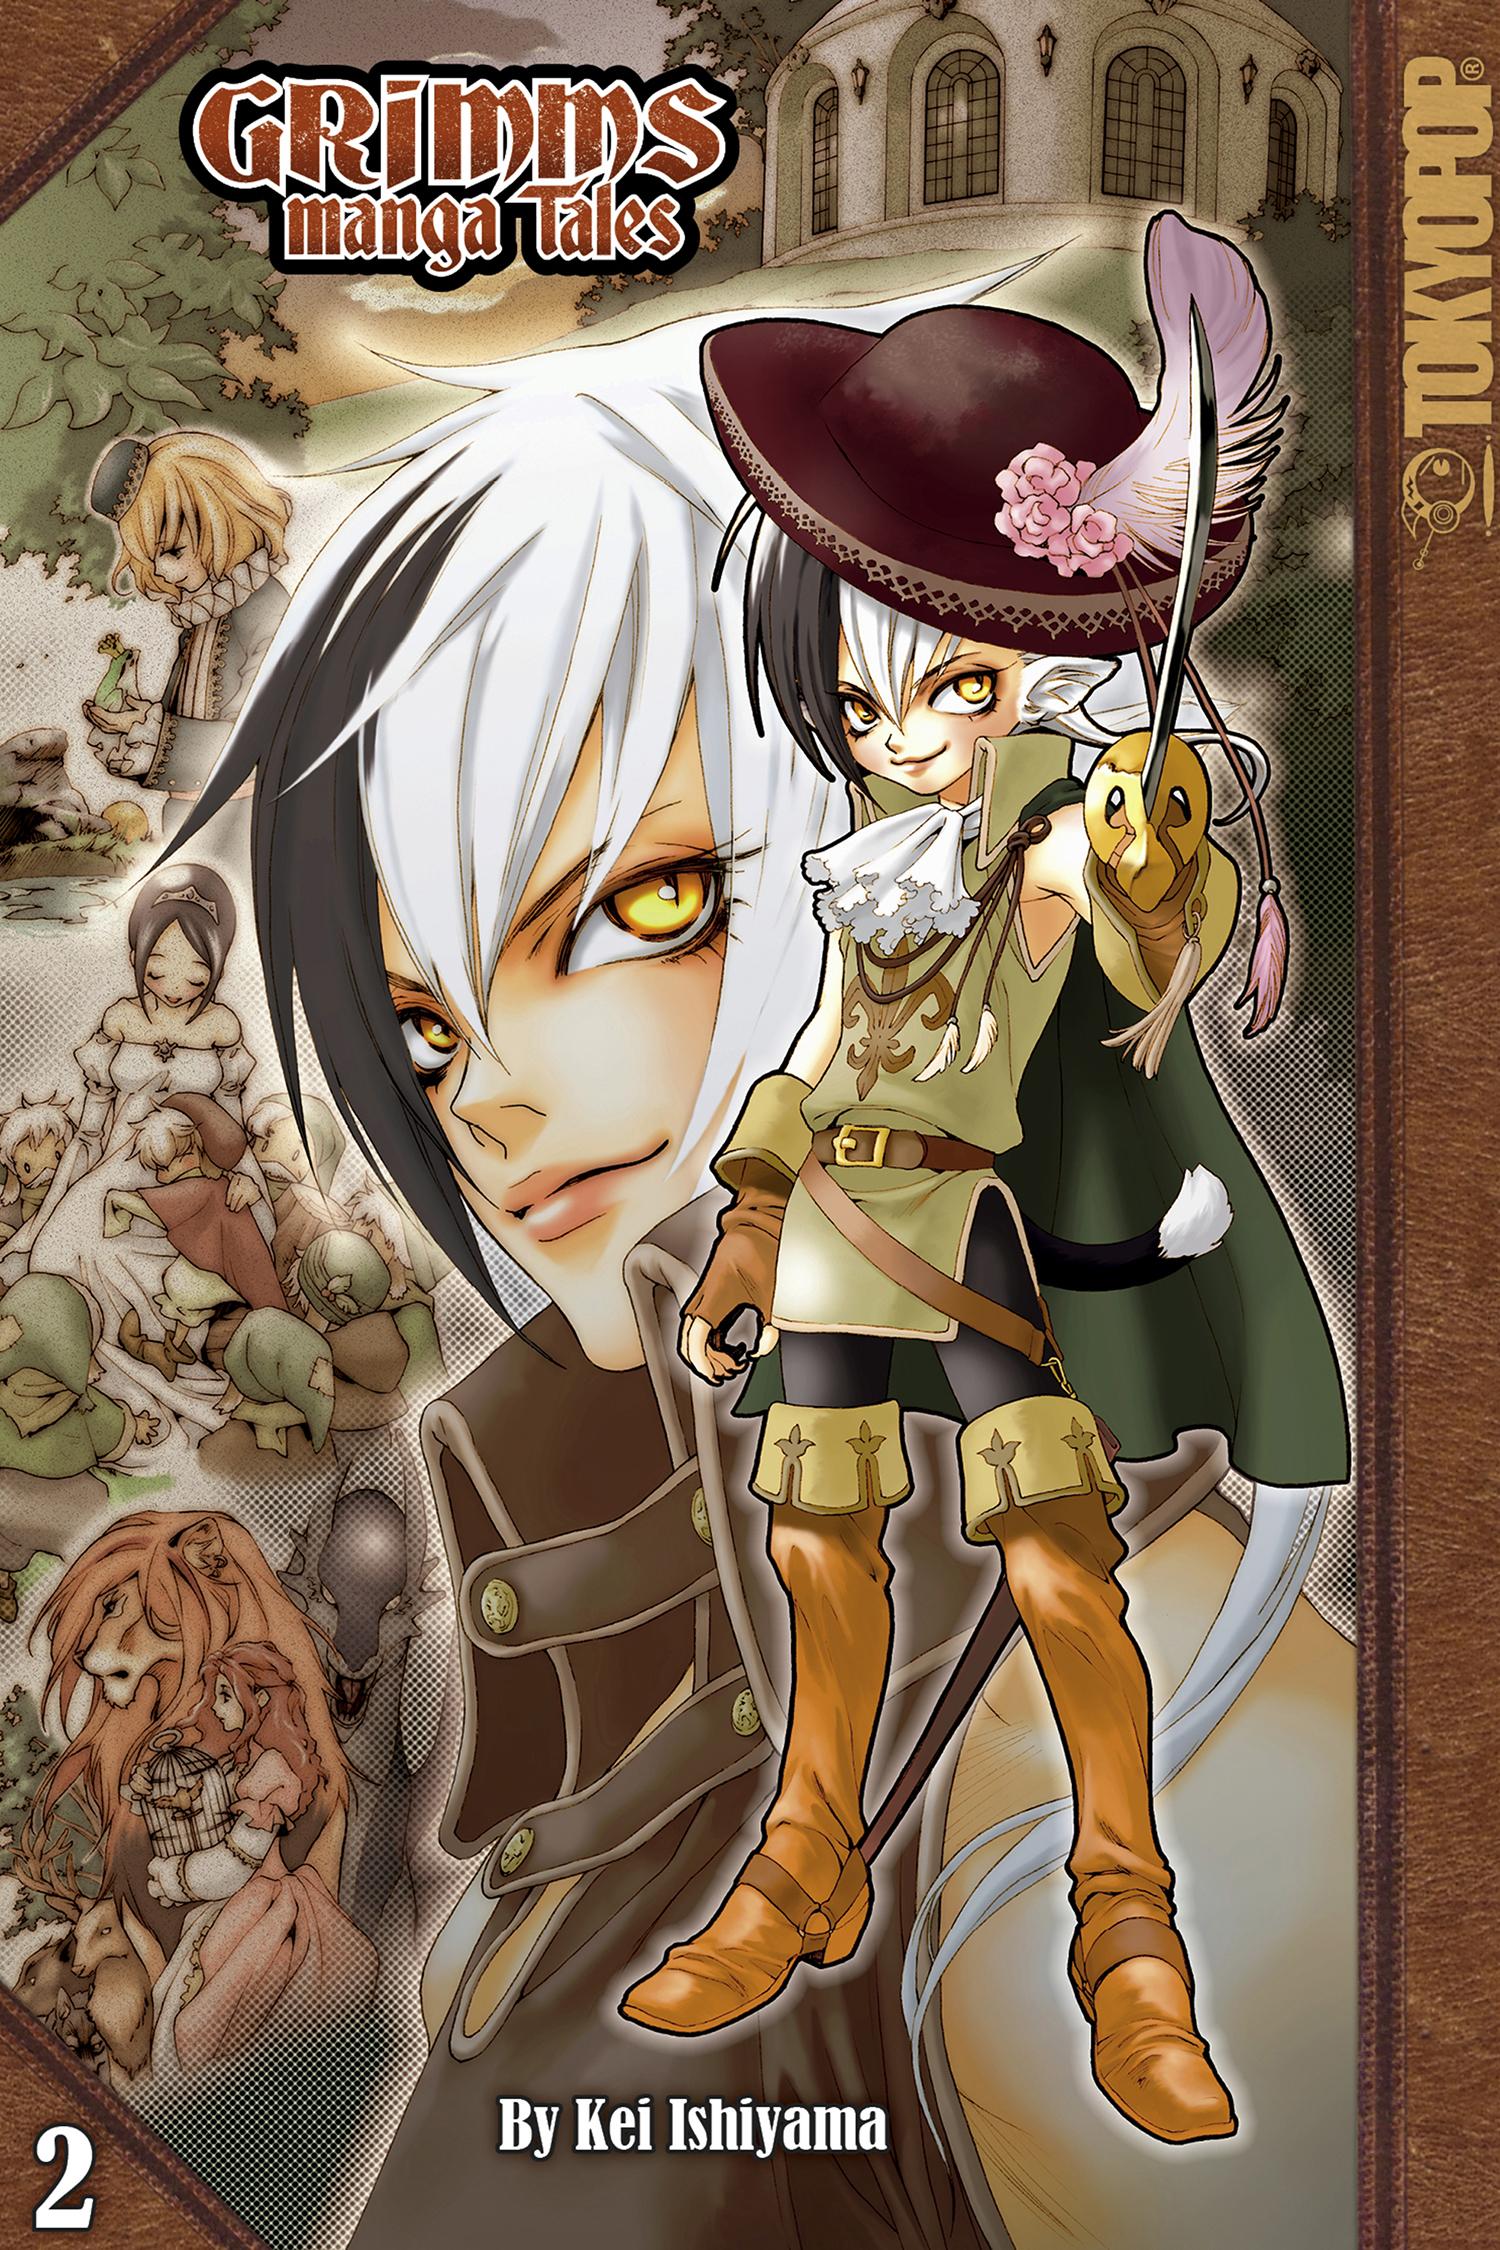 Grimms Manga Tales ebook Vol2 cover (bg).jpg